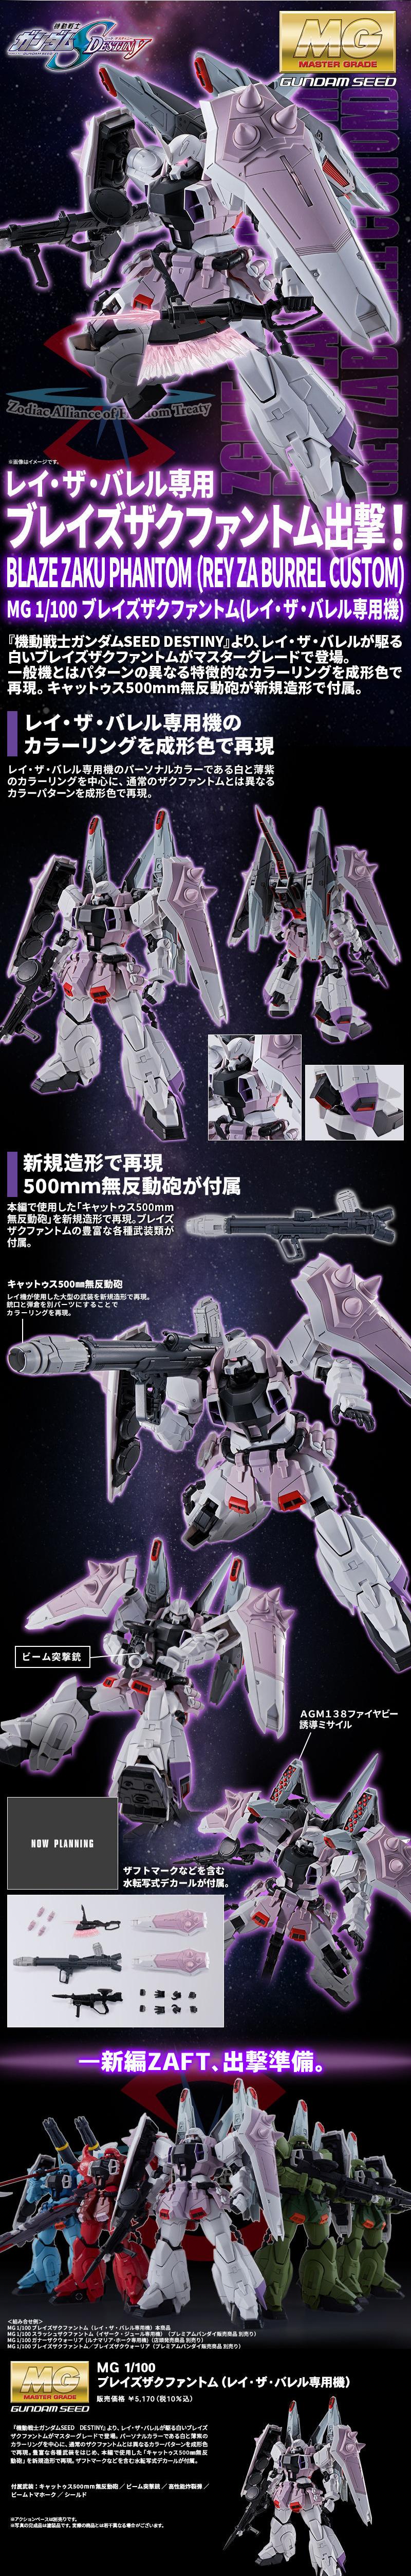 MG 1/100 ブレイズザクファントム(レイ・ザ・バレル専用機) 公式商品説明(画像)